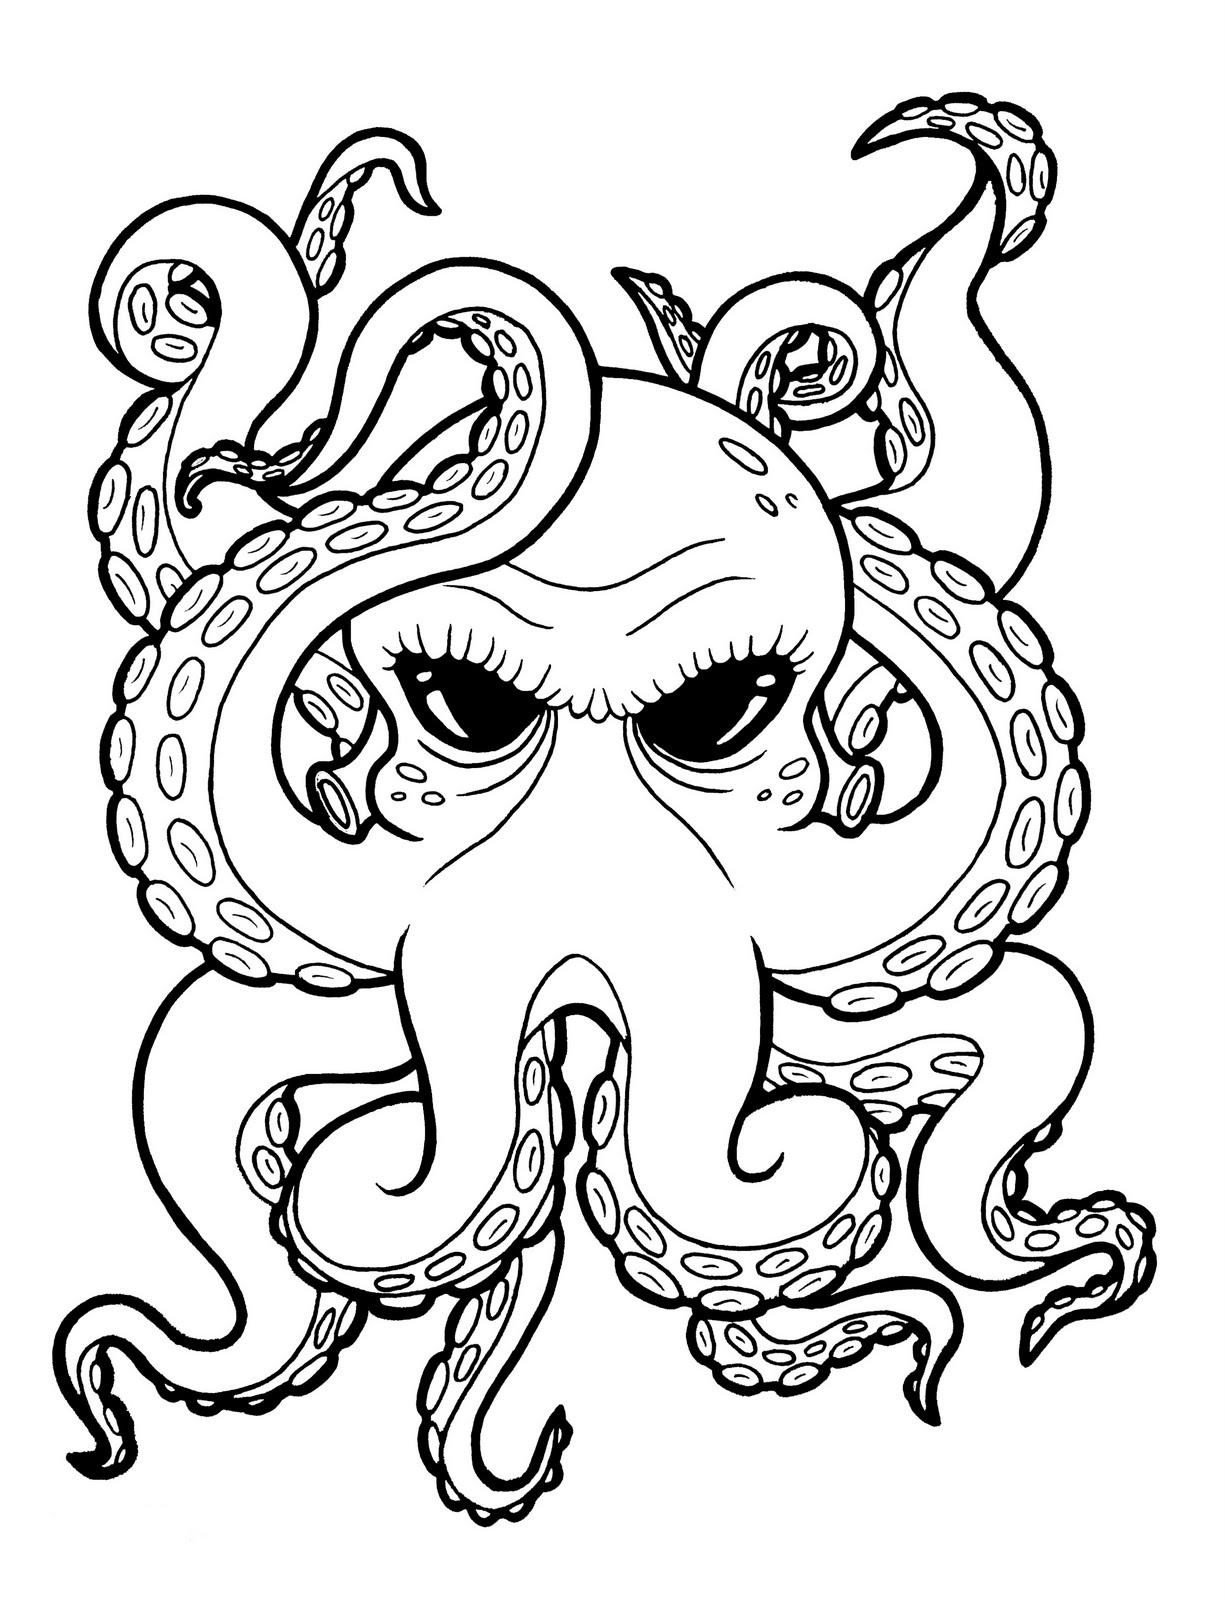 1225x1600 Cartoon Octopus Drawing Cartoon Octopus Drawing Cartoon Octopus